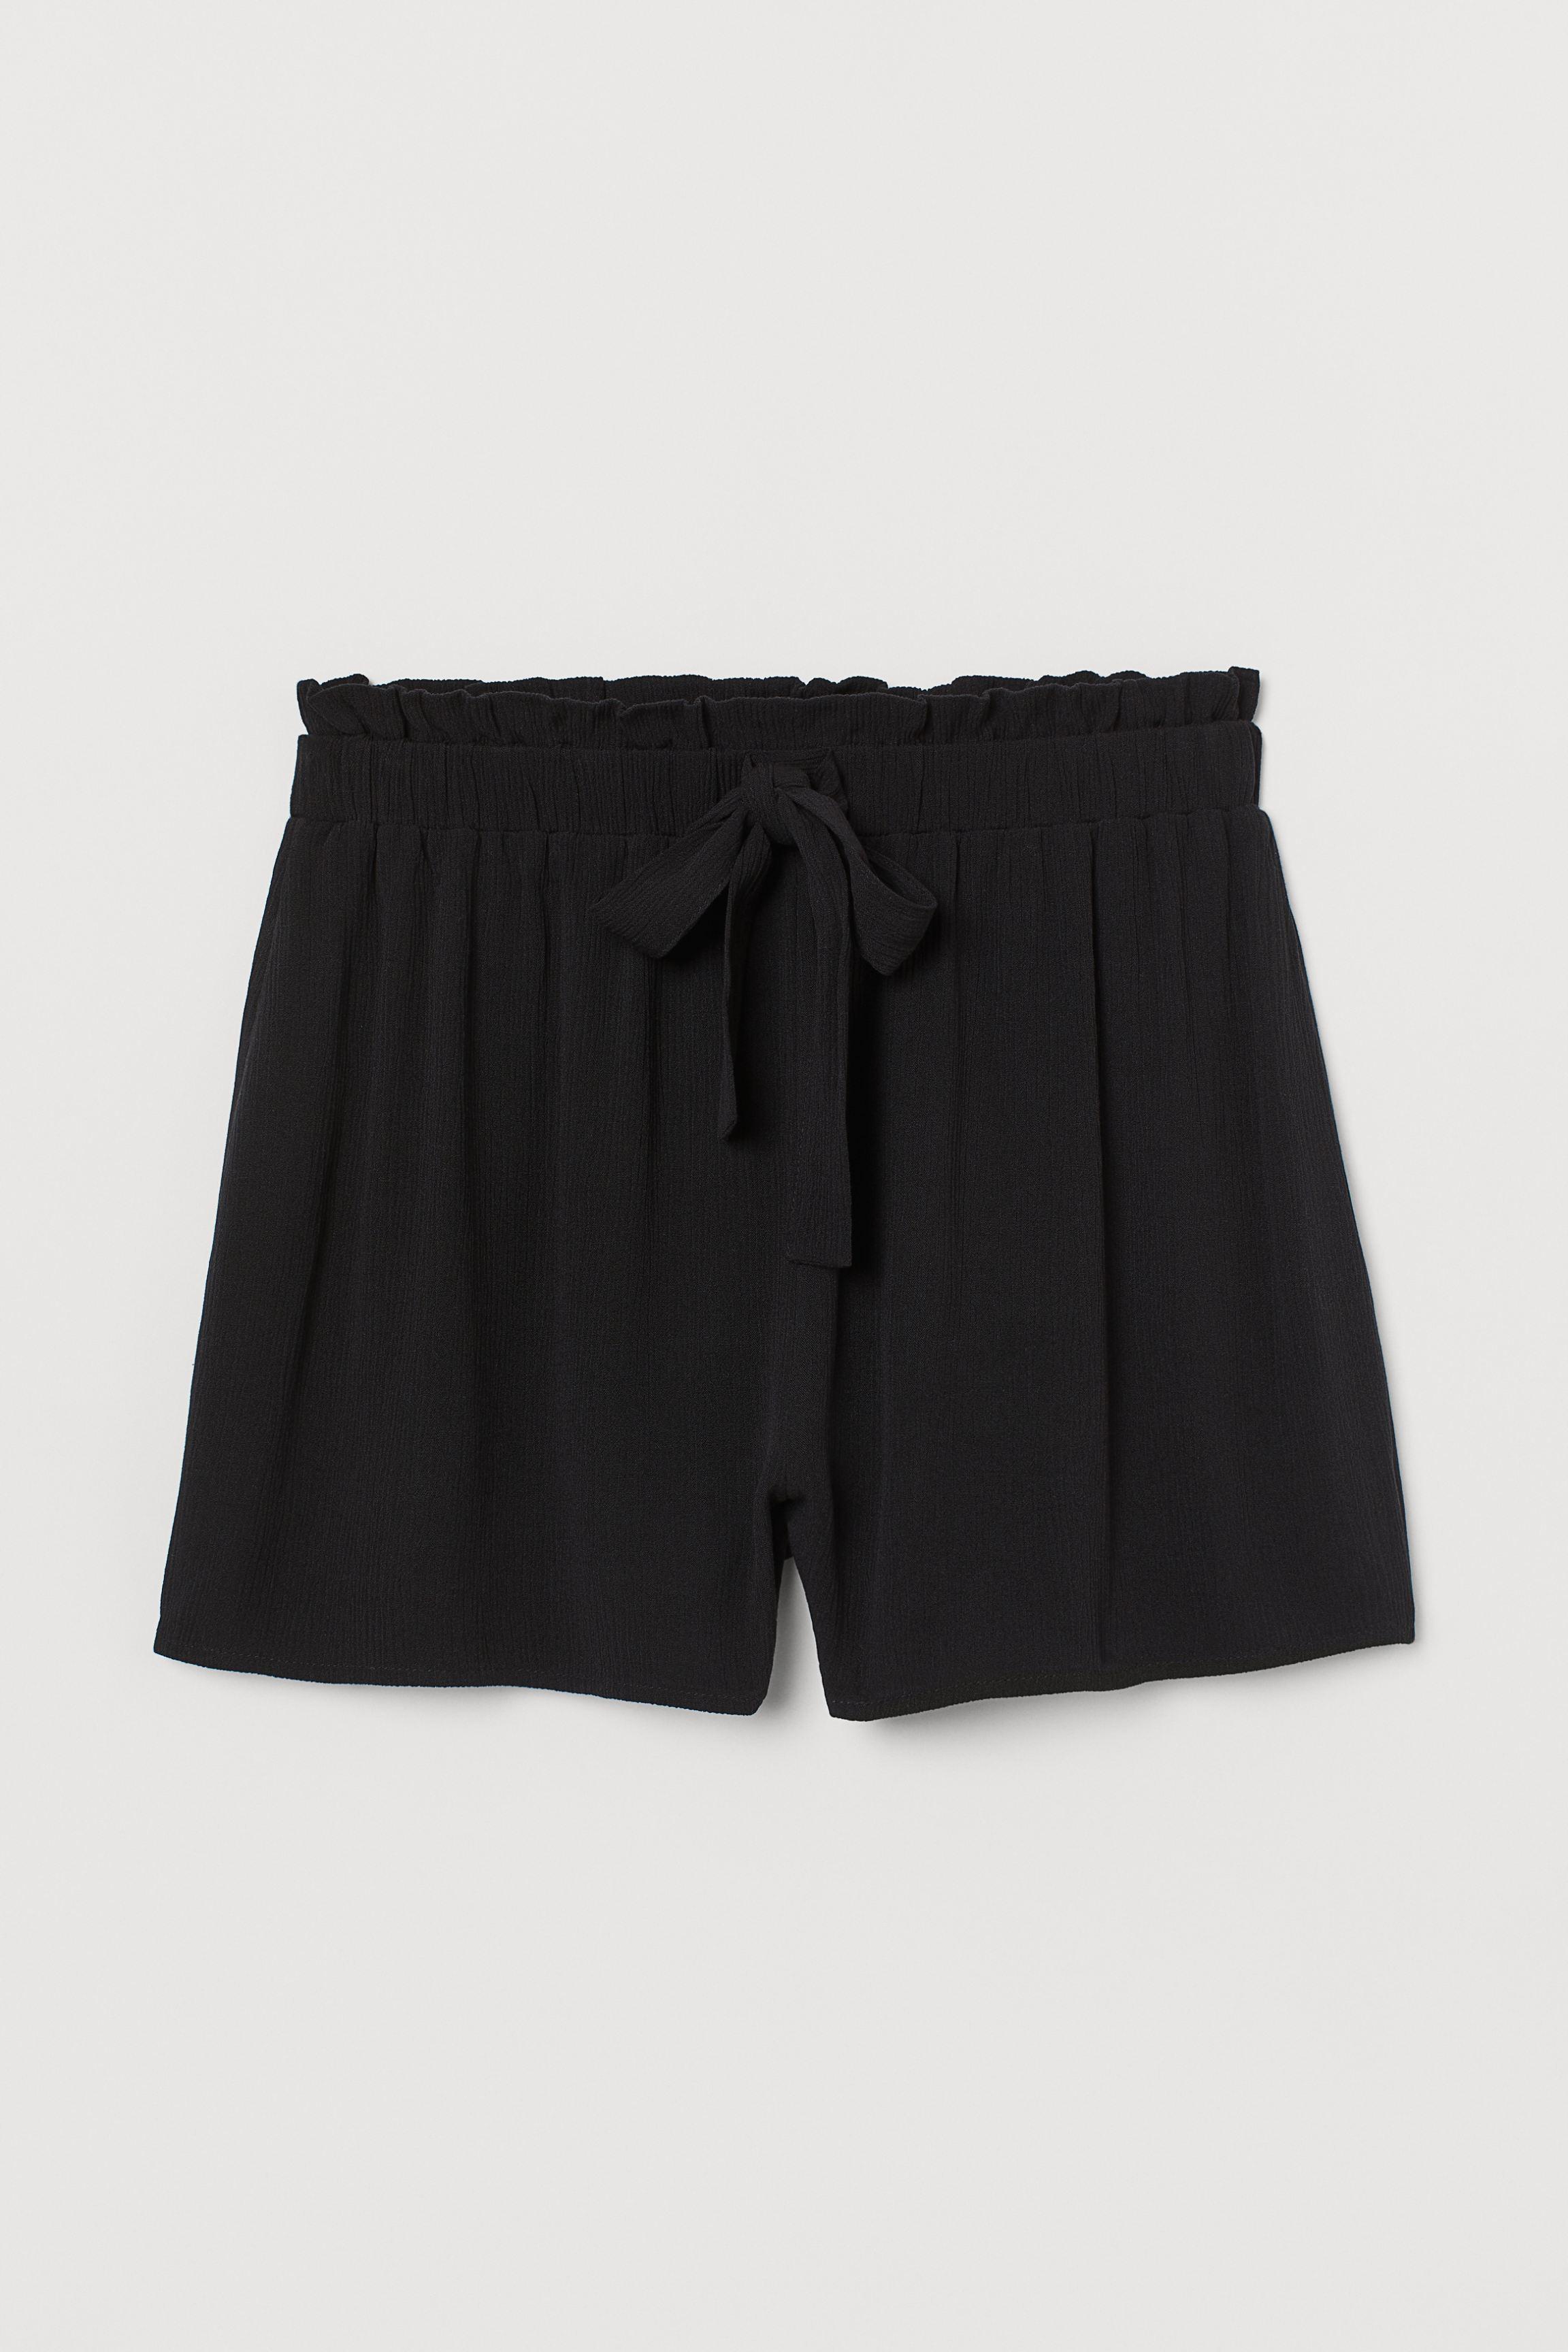 Crinkled Shorts